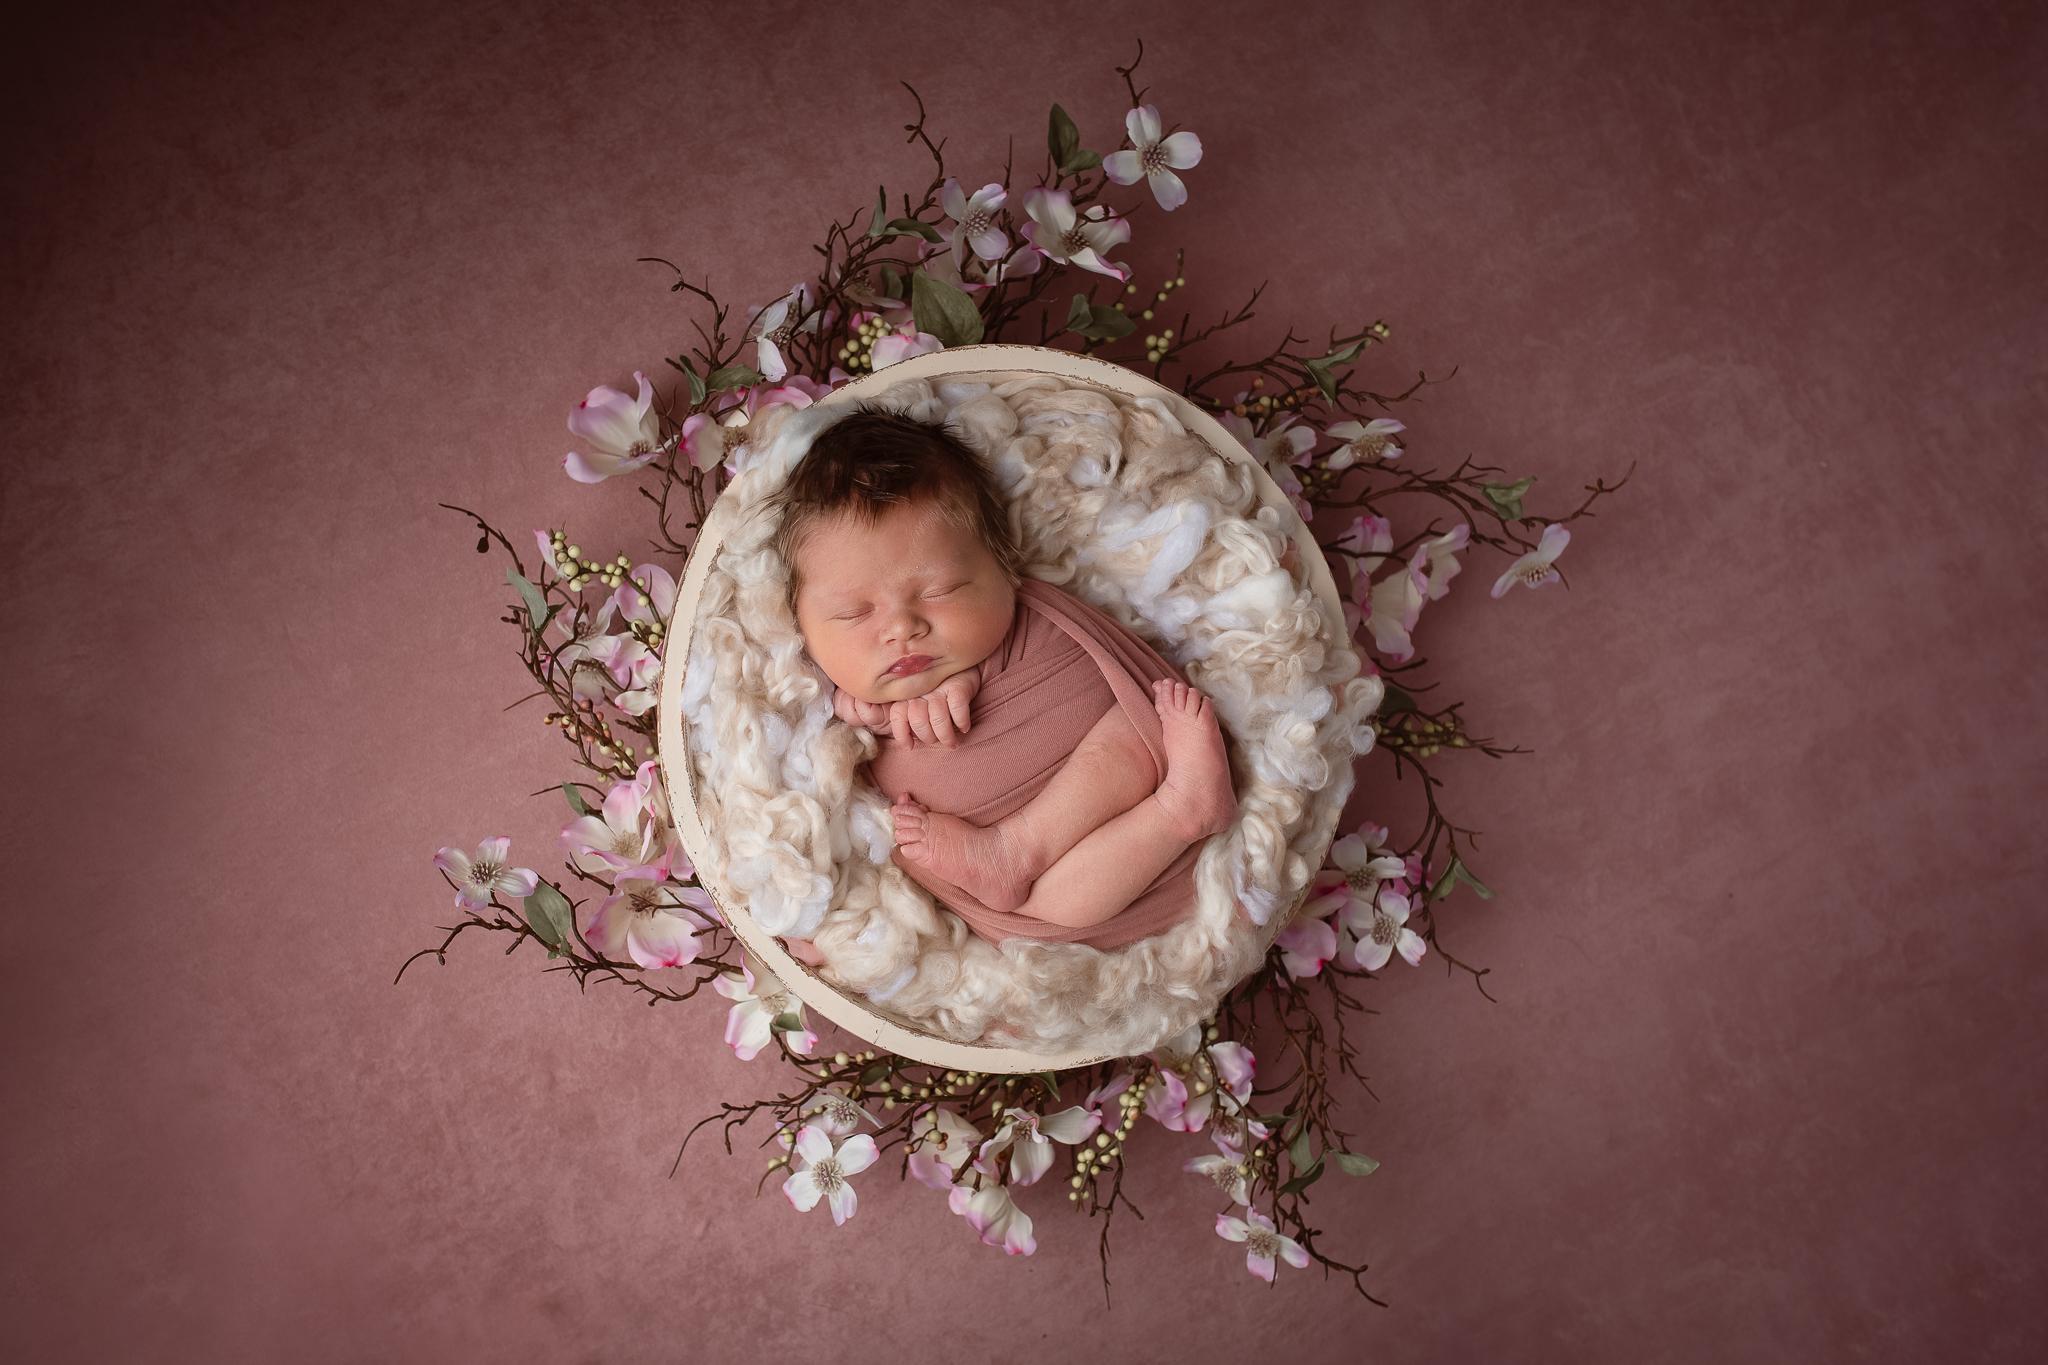 Newborn175NaomiLuciennePhotography062019-2-Edit.jpg